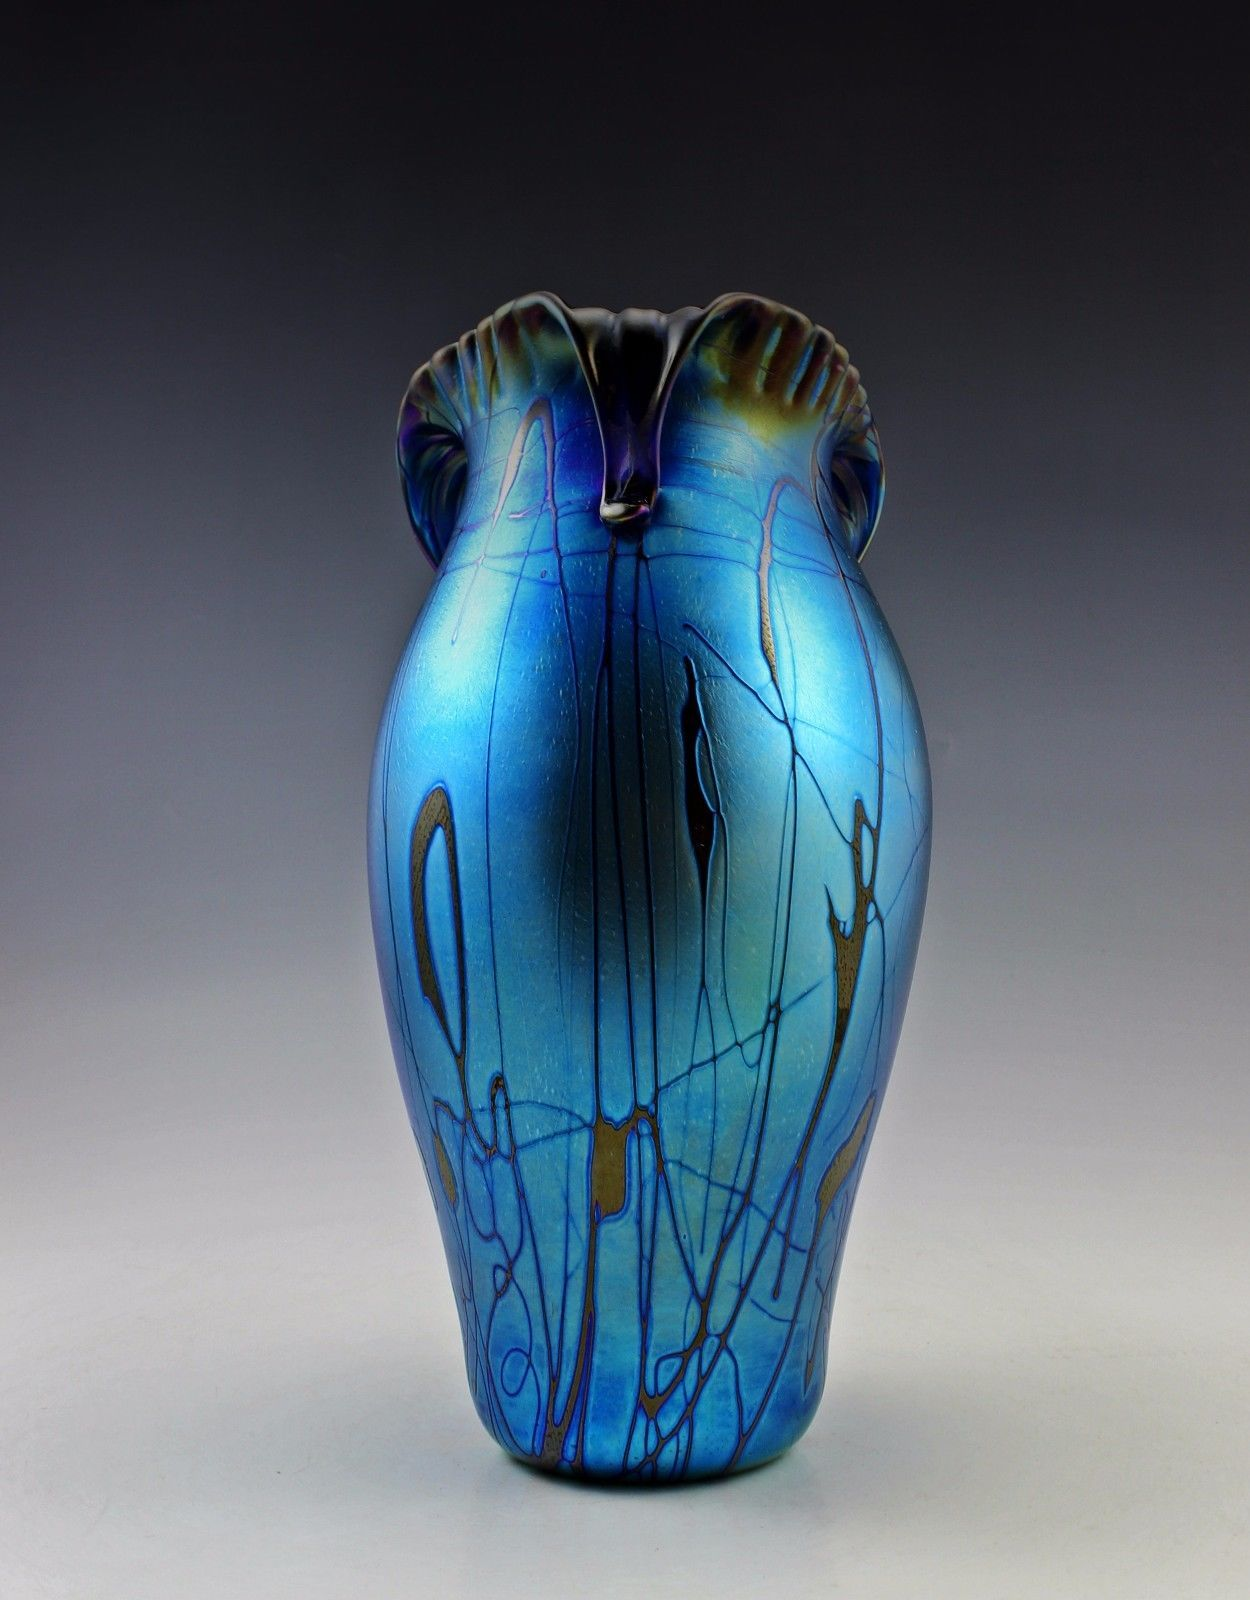 Antiques Glamorous Bohemian Art Nouveau Jugendstil Iridescent Large Glass Vase